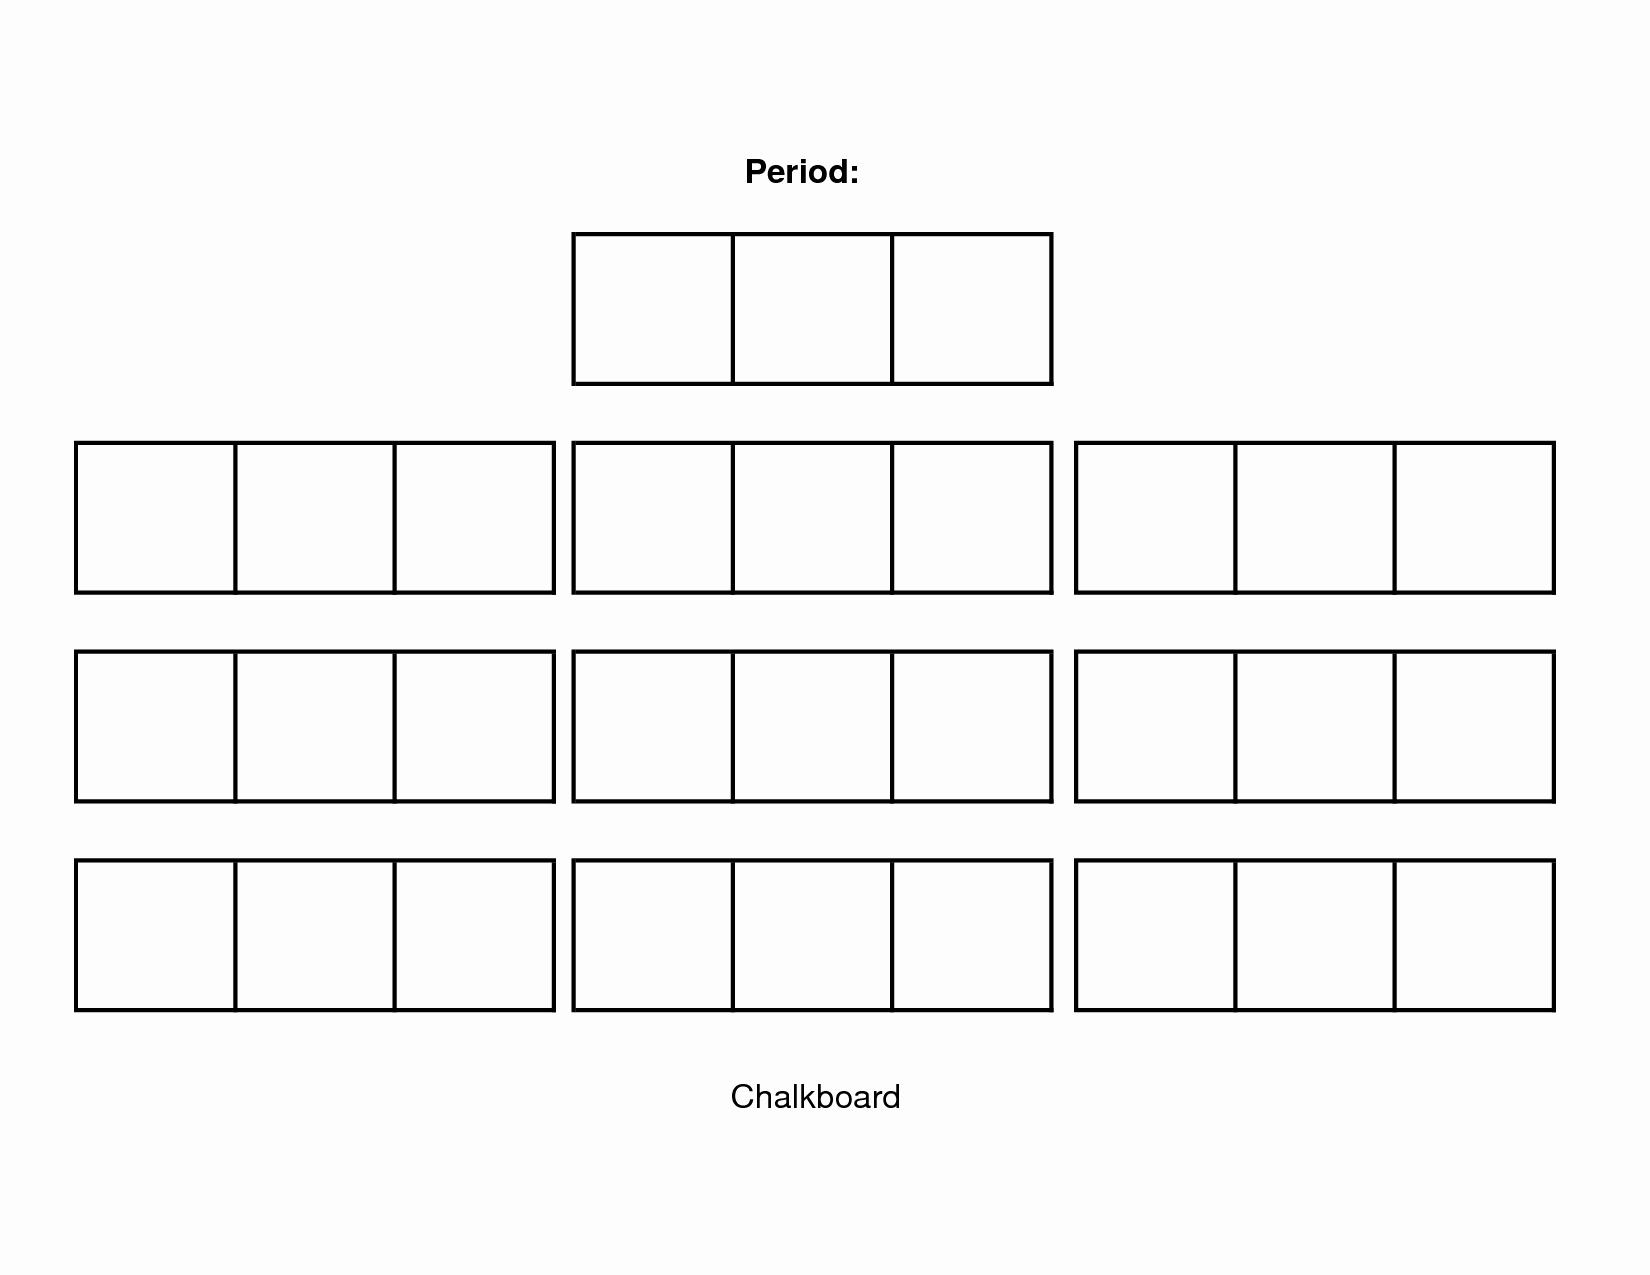 Free Classroom Seating Chart Maker Portablegasgrillweber